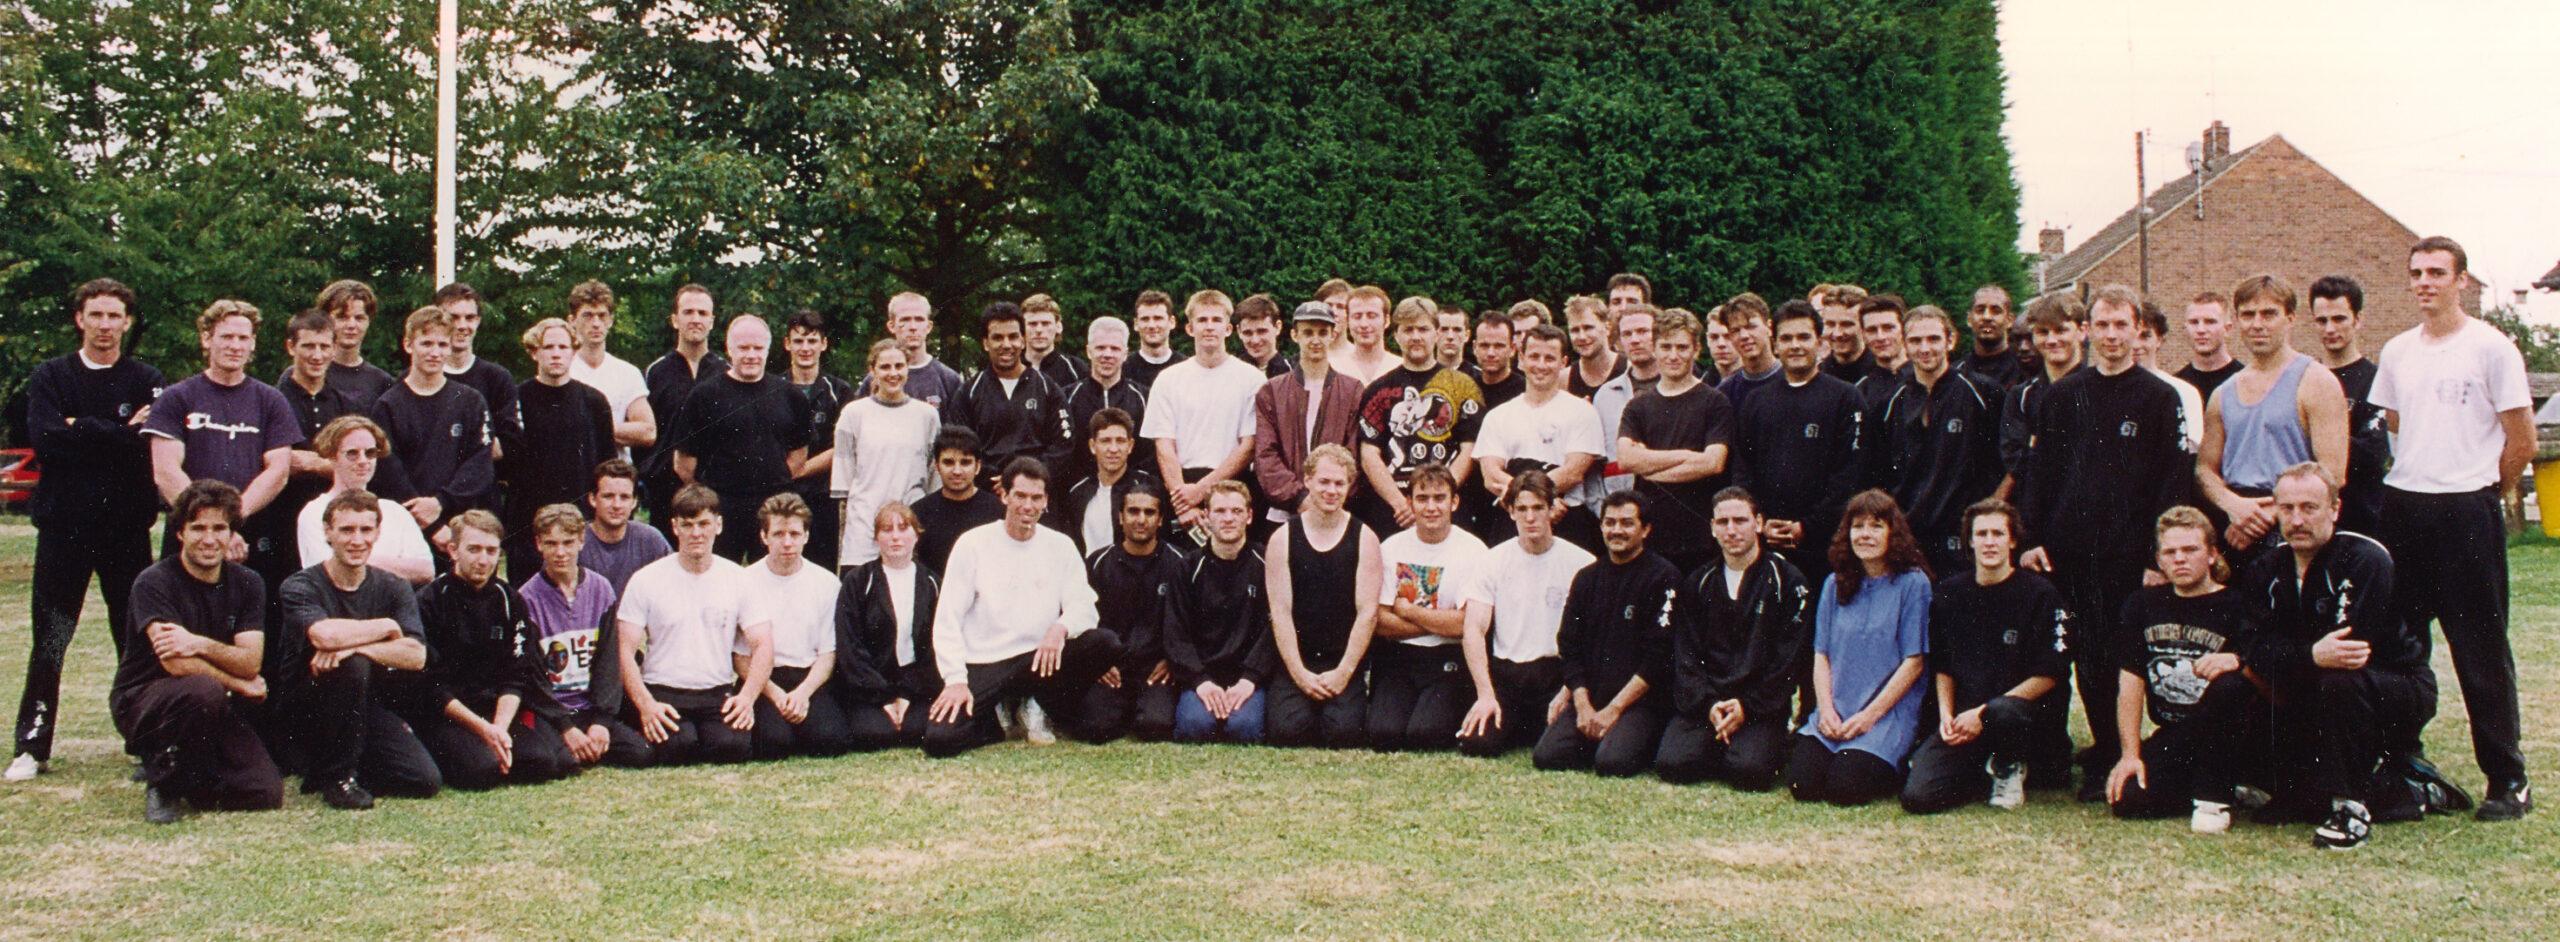 Wing Chun Summer Camp 1993